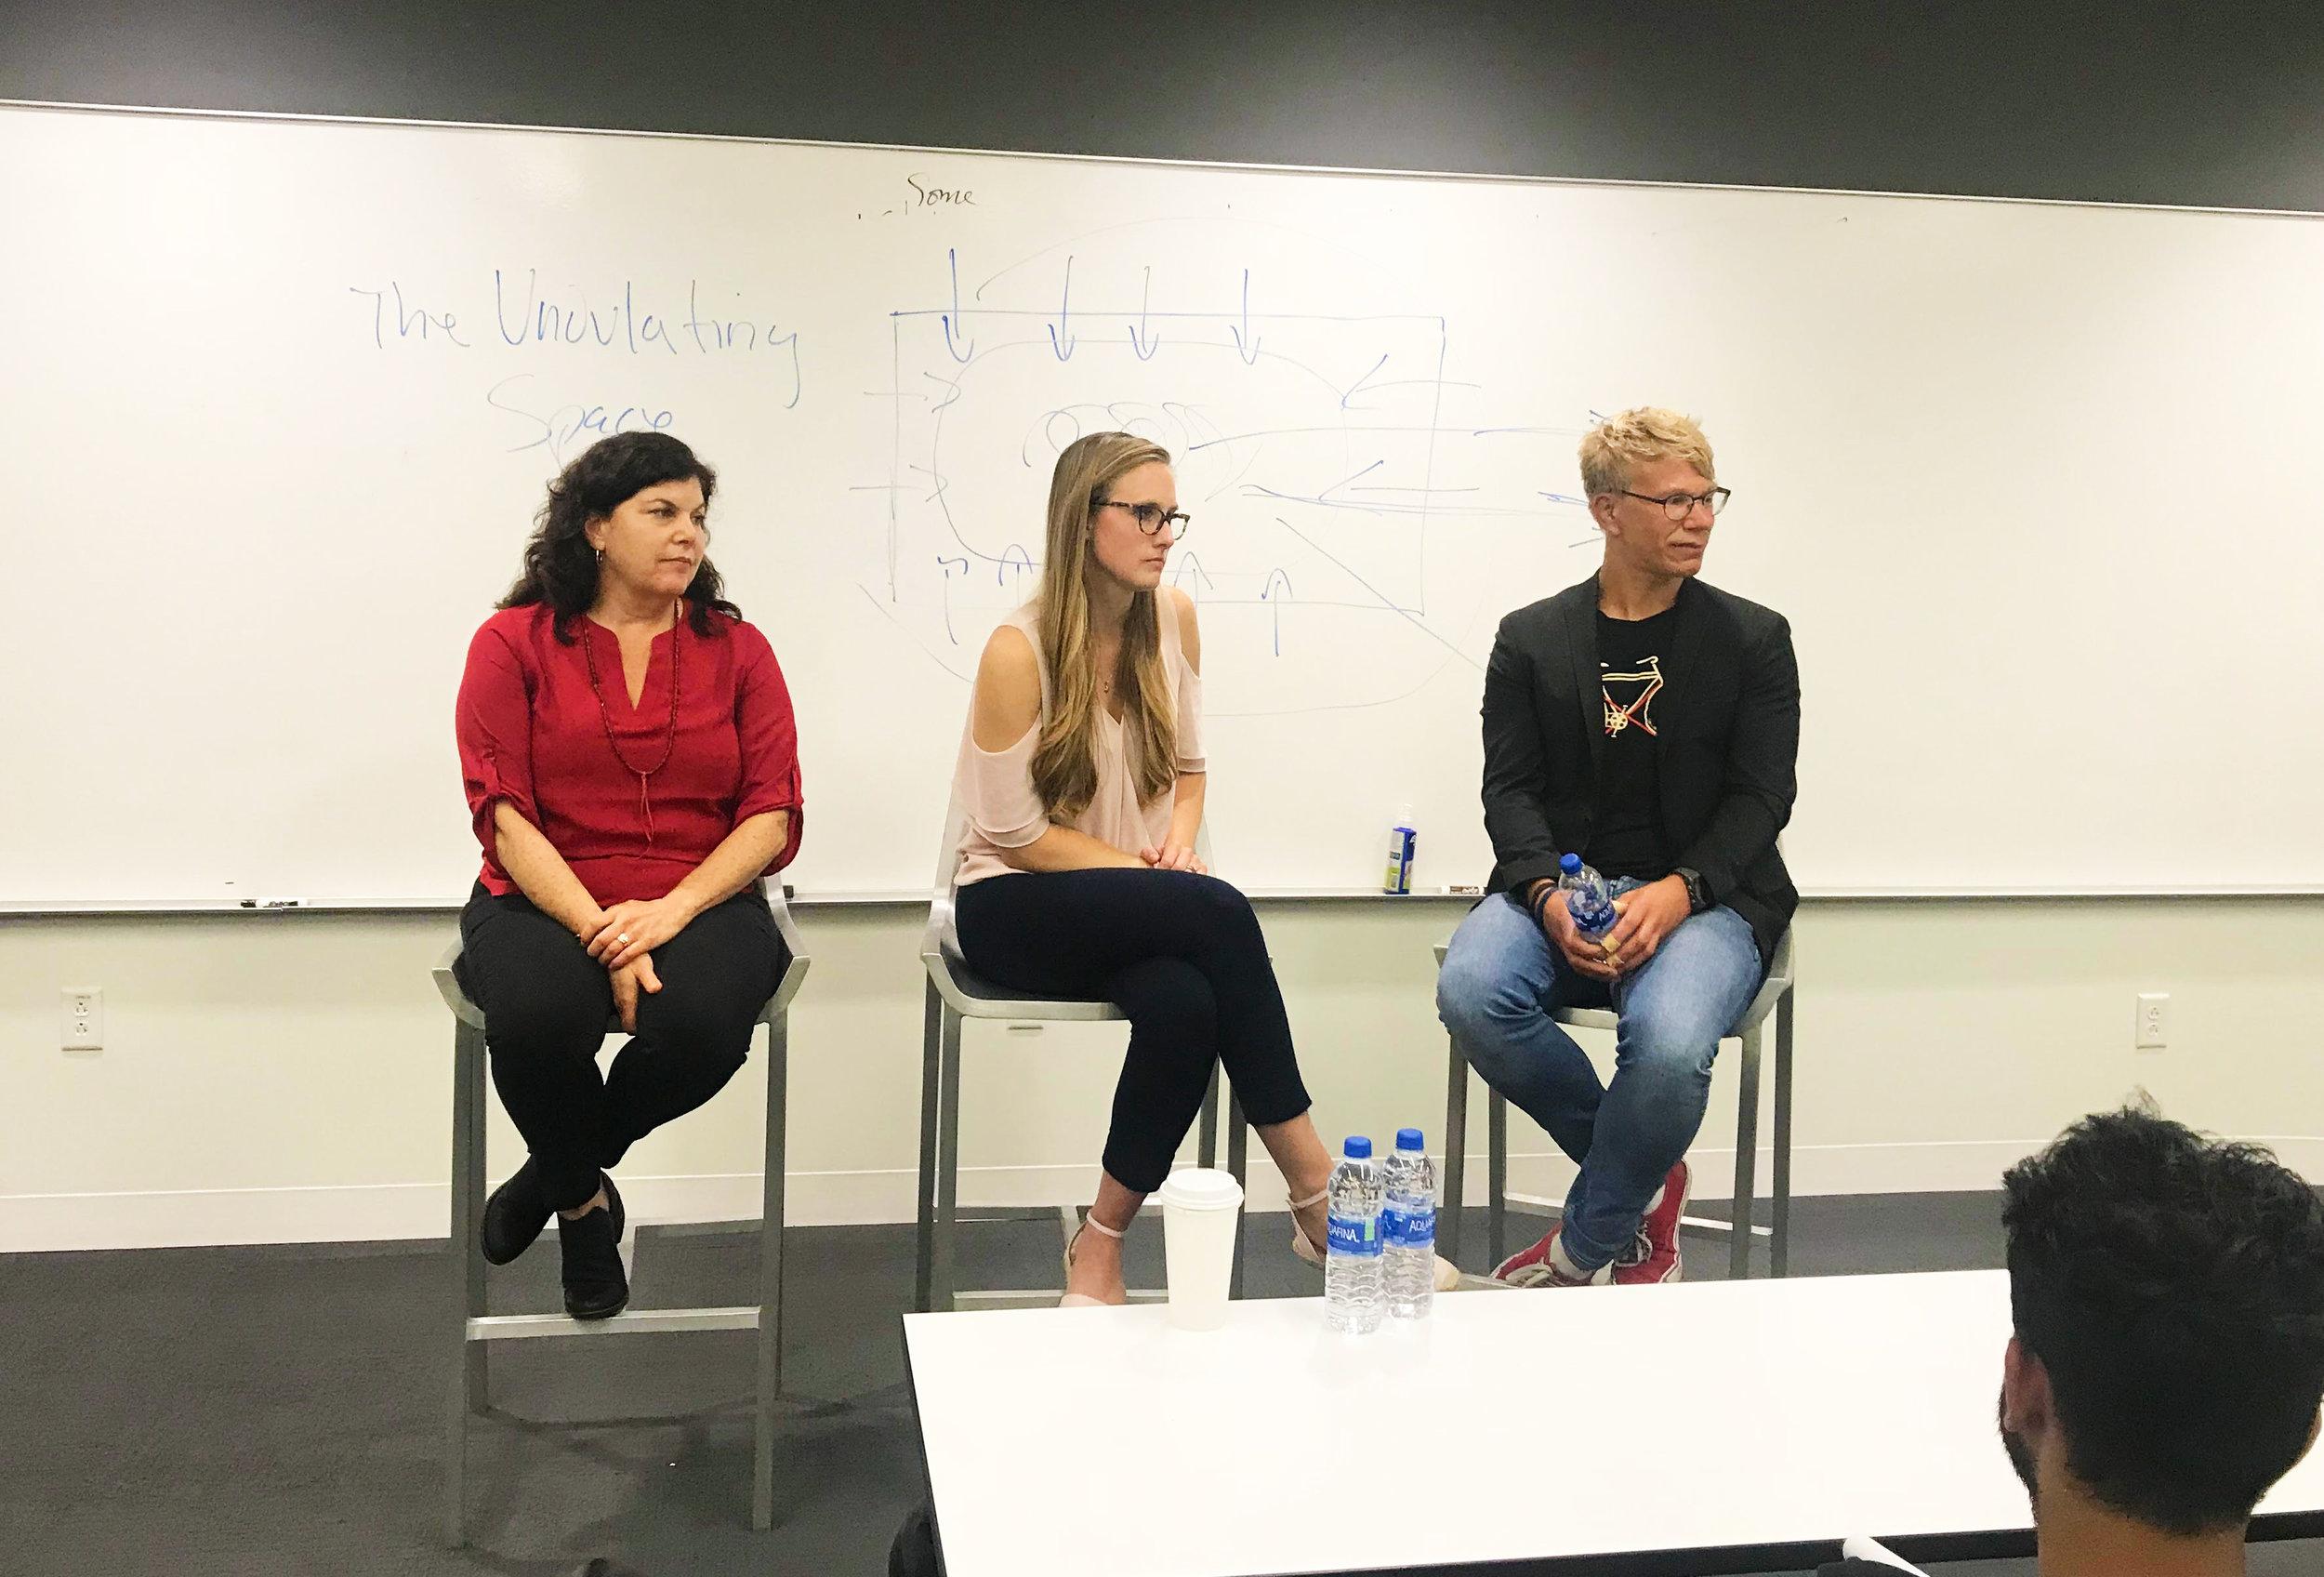 From left to right: Jennifer Baker, Executive Director, Golin-Harris, LA. Megan Castilla, former student, Principal, Hill+Knowlton Strategies, LA. Frederick Pruss, former student, Crisis Management, Edelman, Berlin.